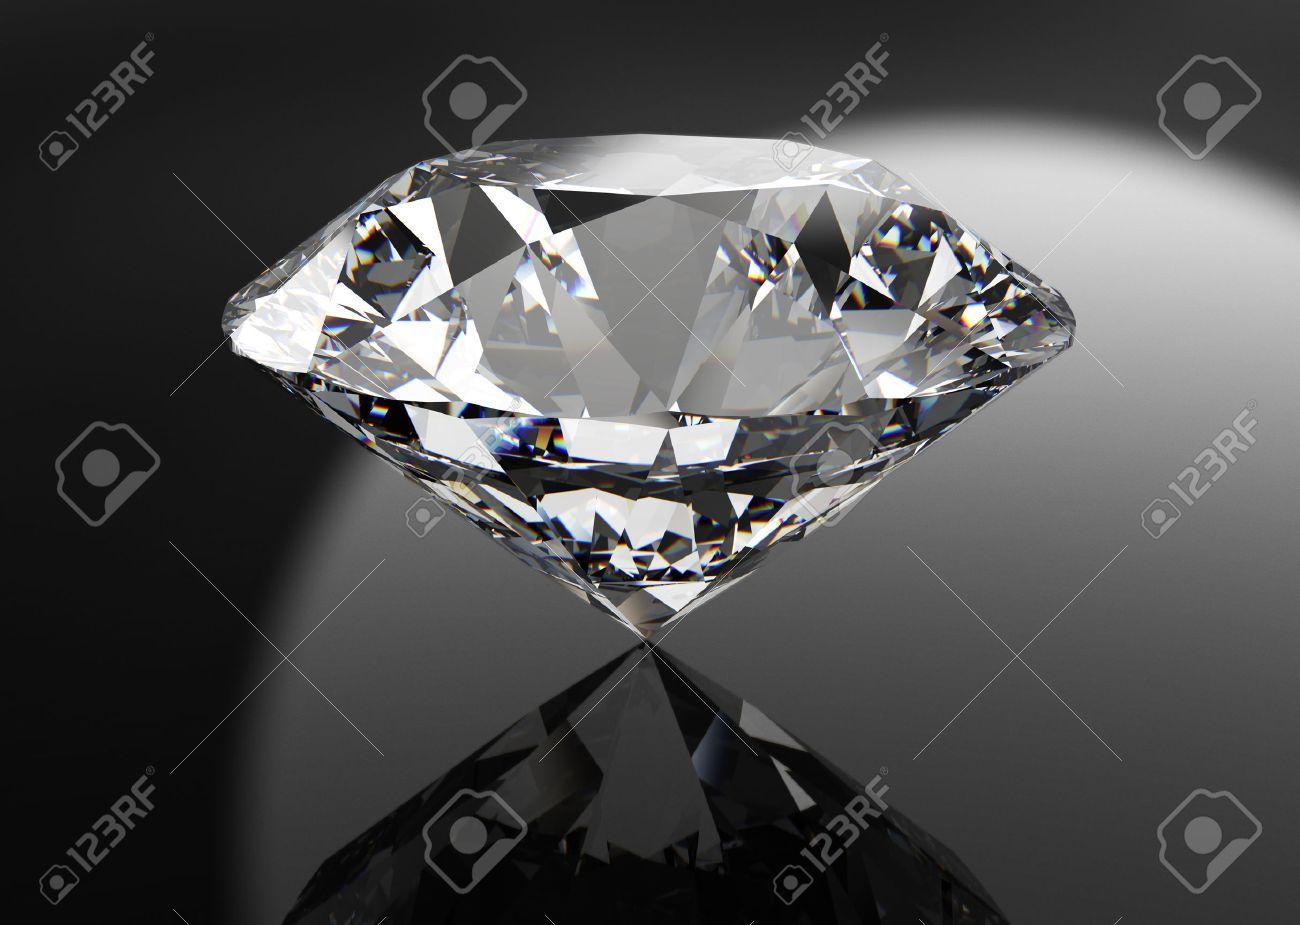 84df75888 55,968 Gemstone Stock Vector Illustration And Royalty Free Gemstone ...